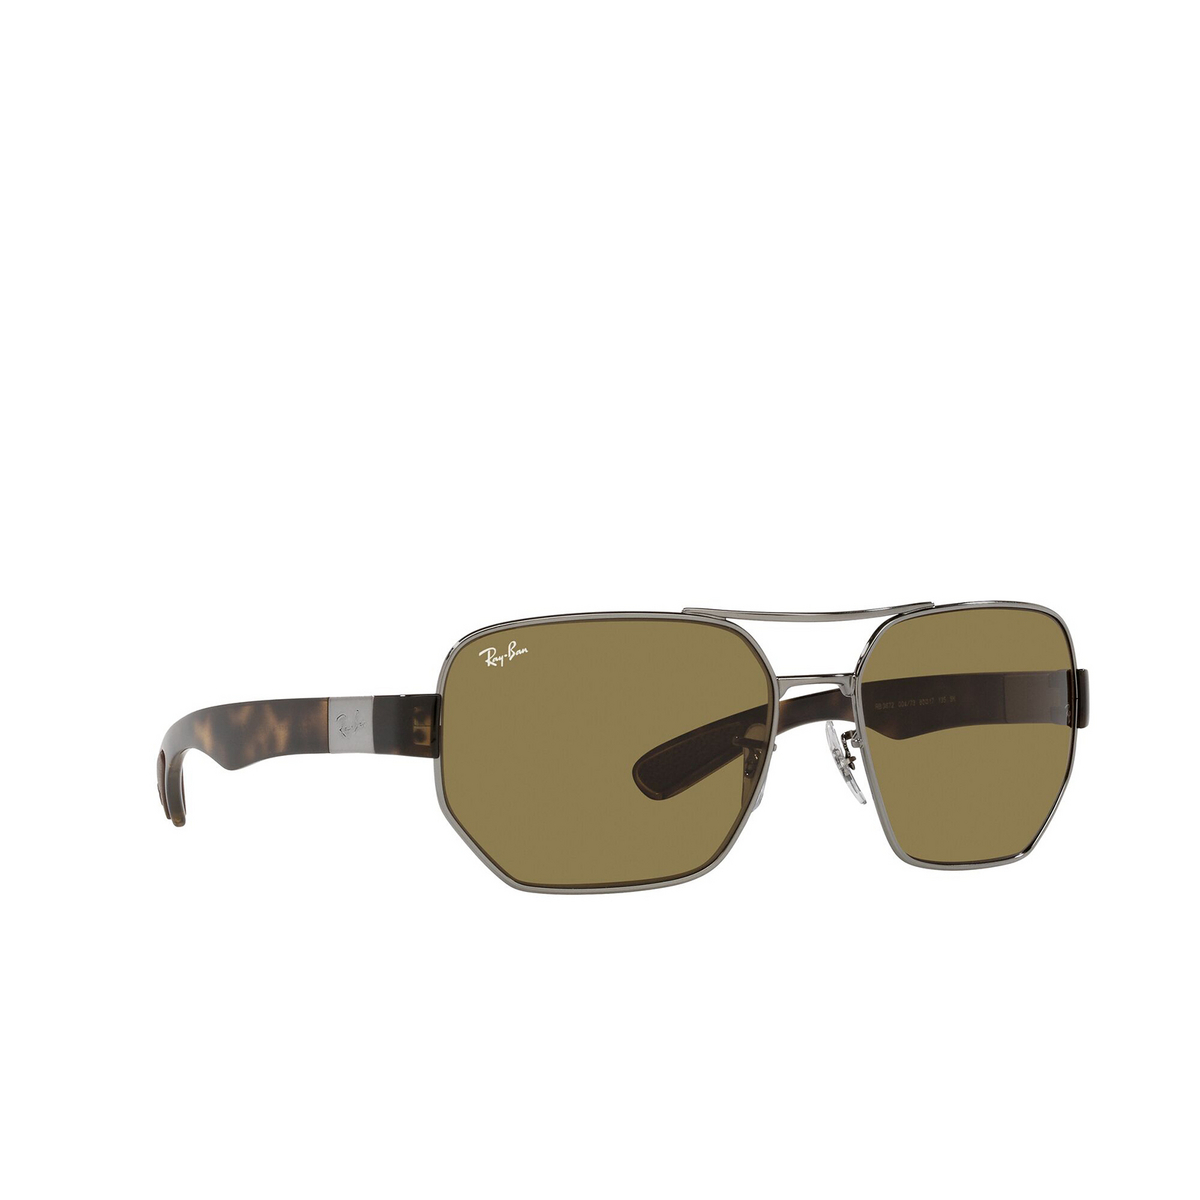 Ray-Ban® Irregular Sunglasses: RB3672 color Gunmetal 004/73 - three-quarters view.